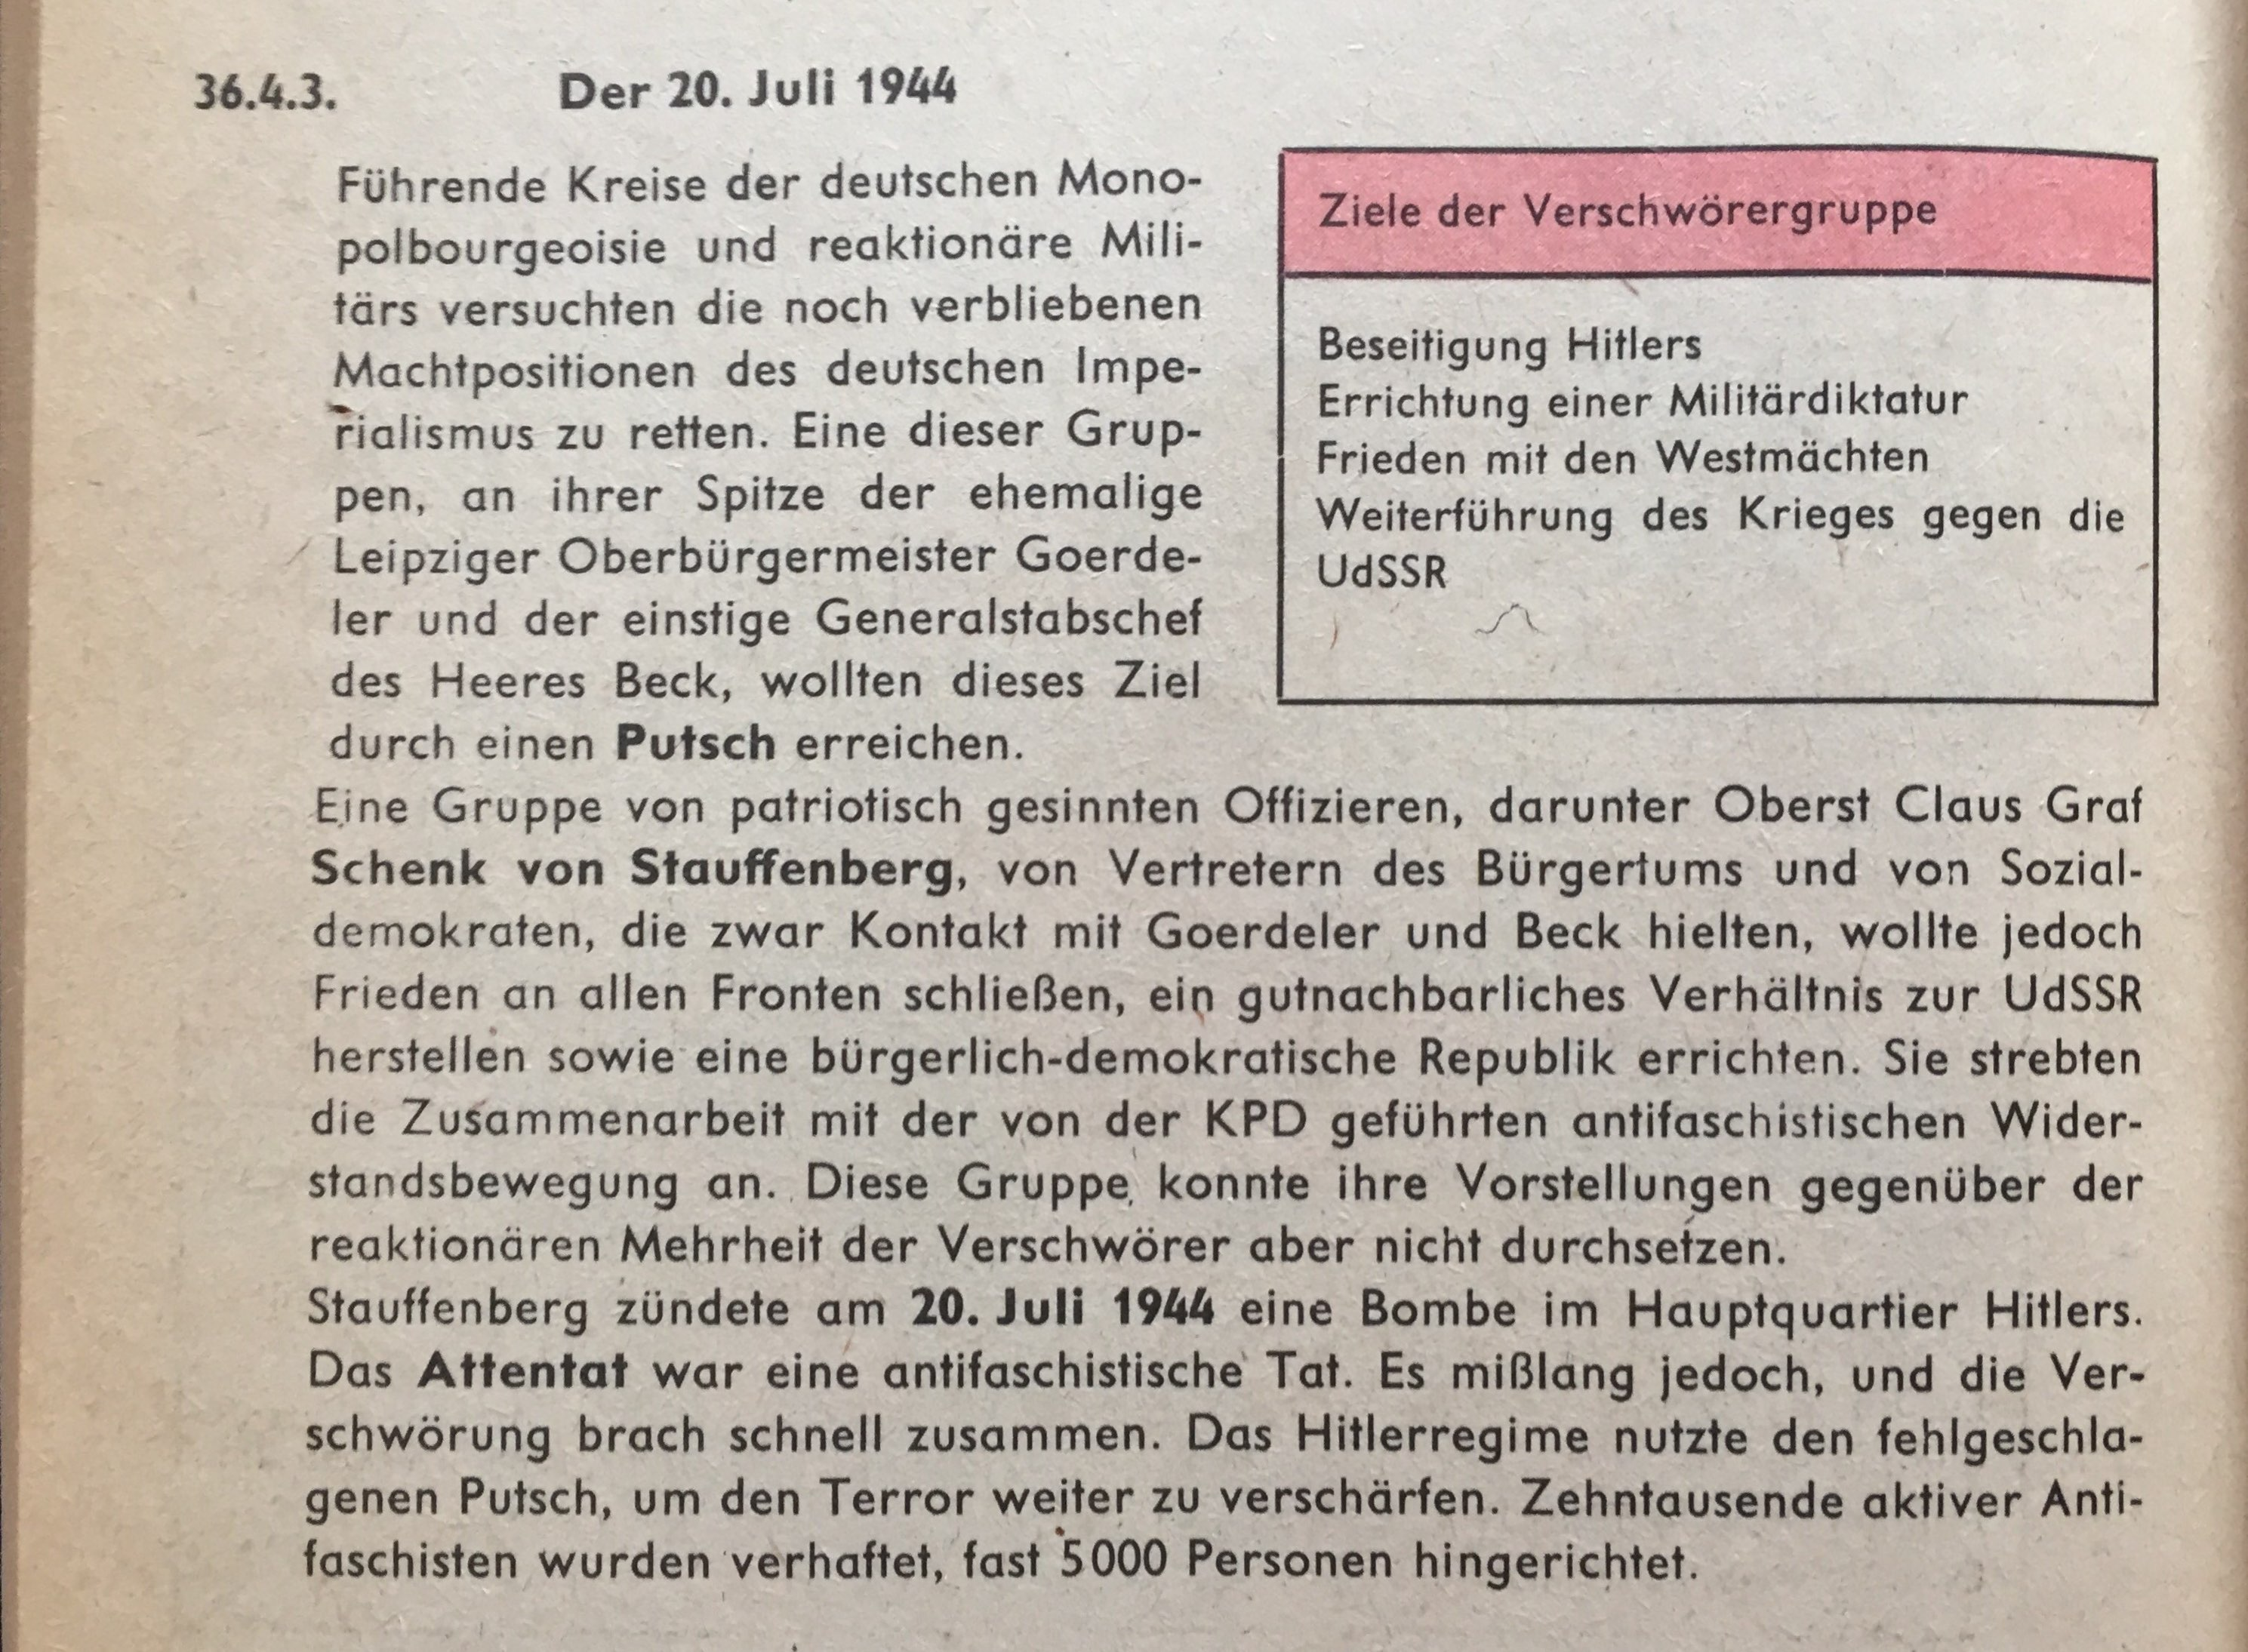 20.07.1944